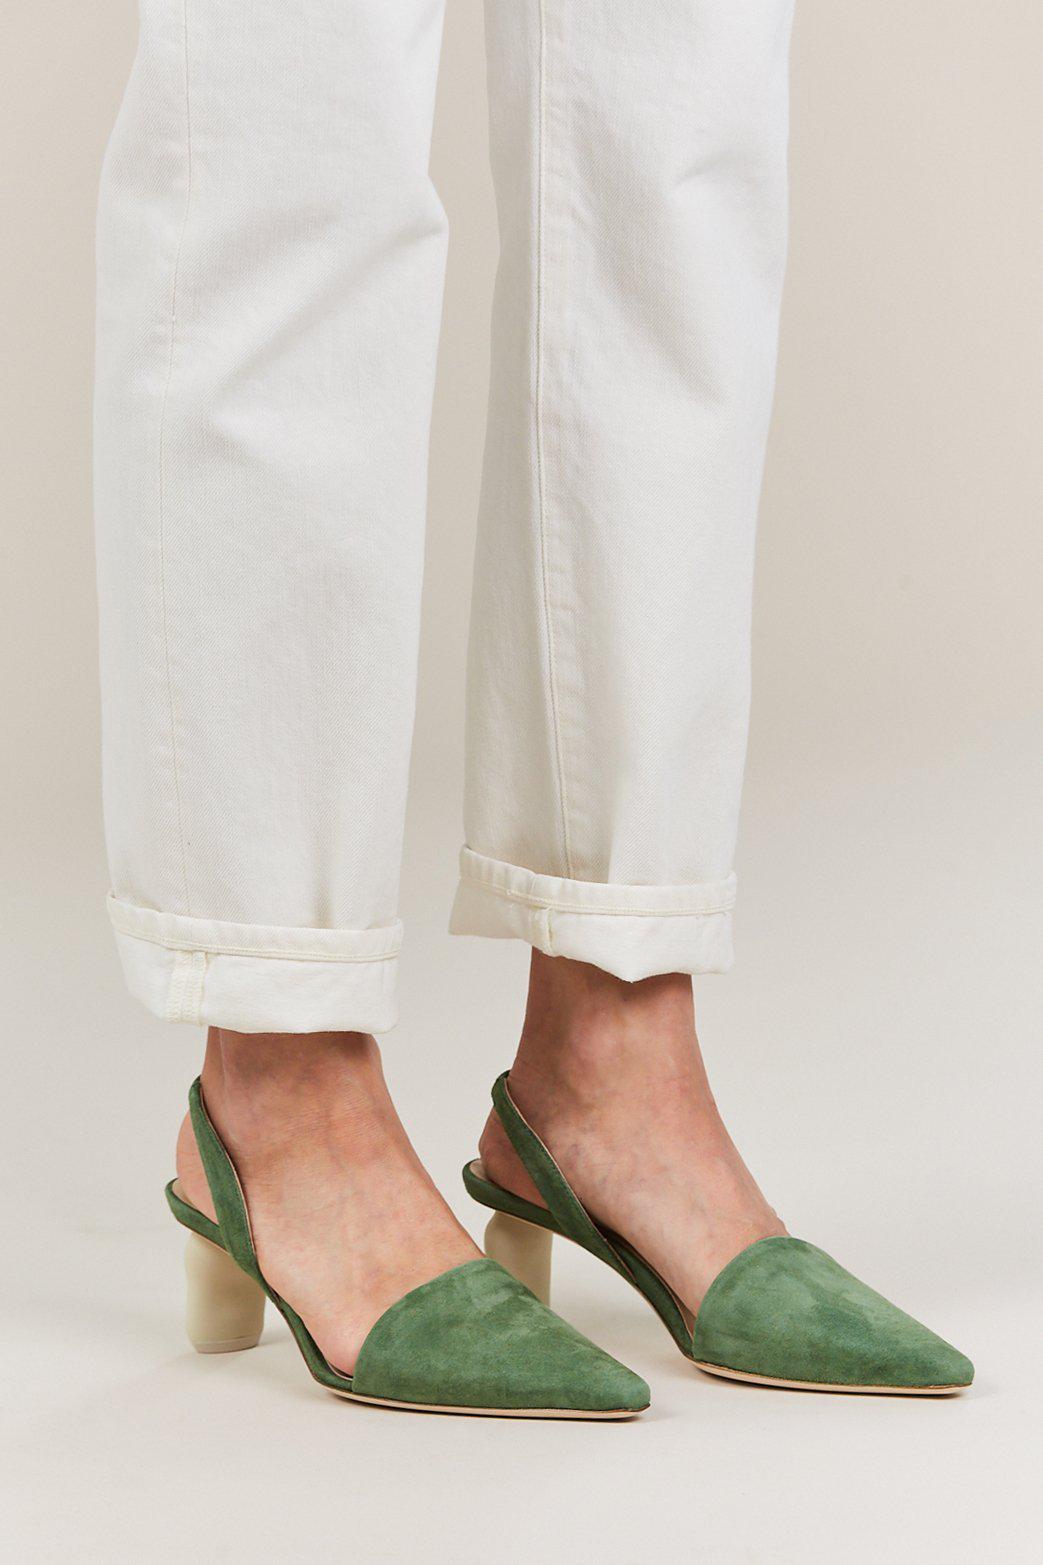 51e0ee97b4 Rejina Pyo Conie Slingback Heel in Green - Lyst